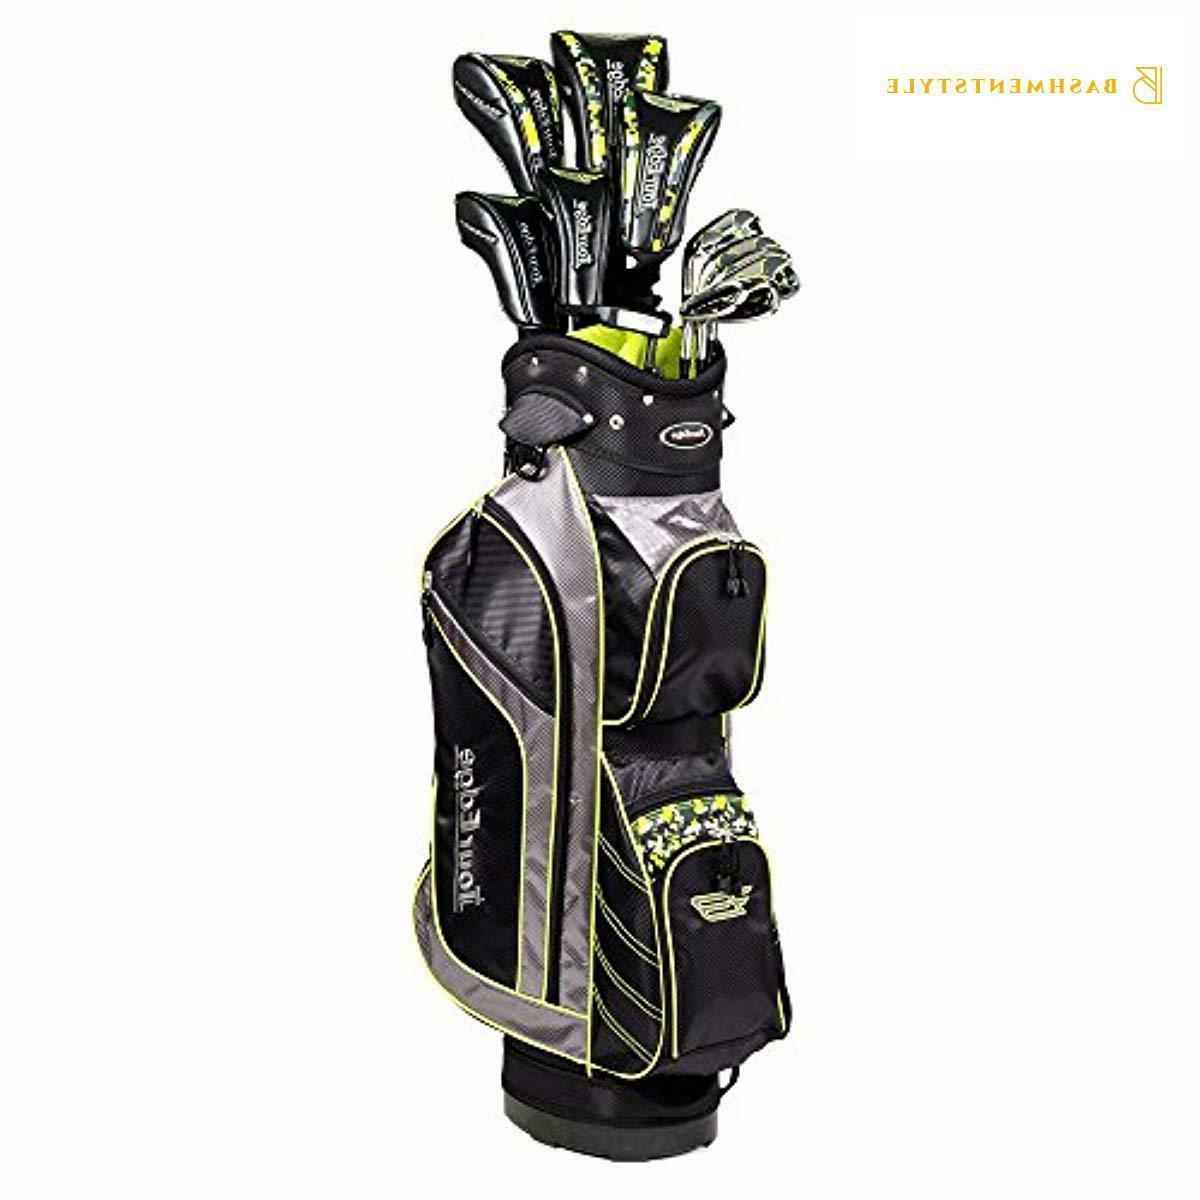 Steel Full Golf Club Set, Black